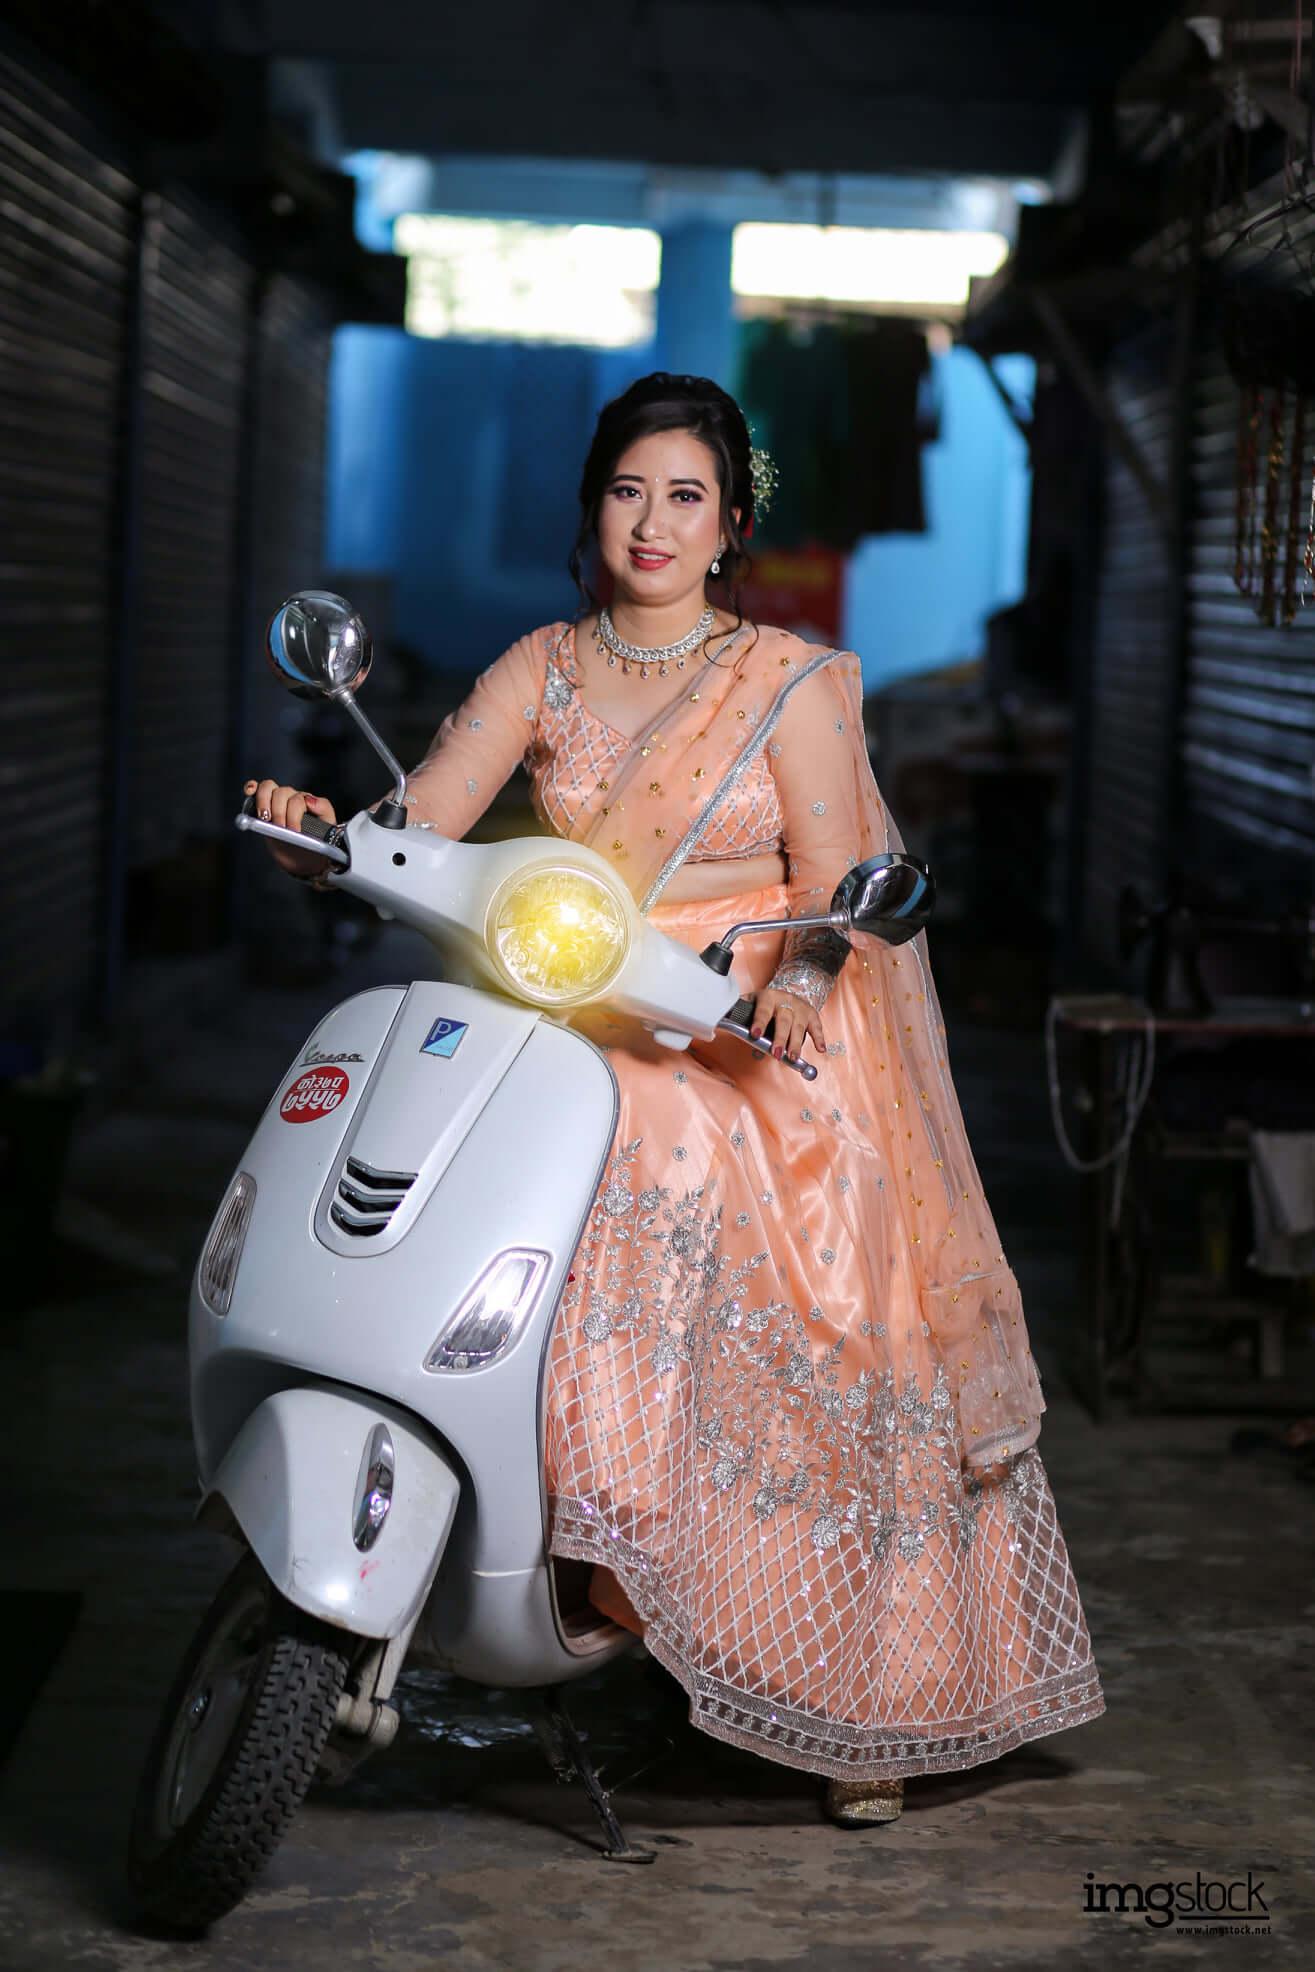 Esha Weds Ritesh - Wedding photography - ImgStock, Biratnagar